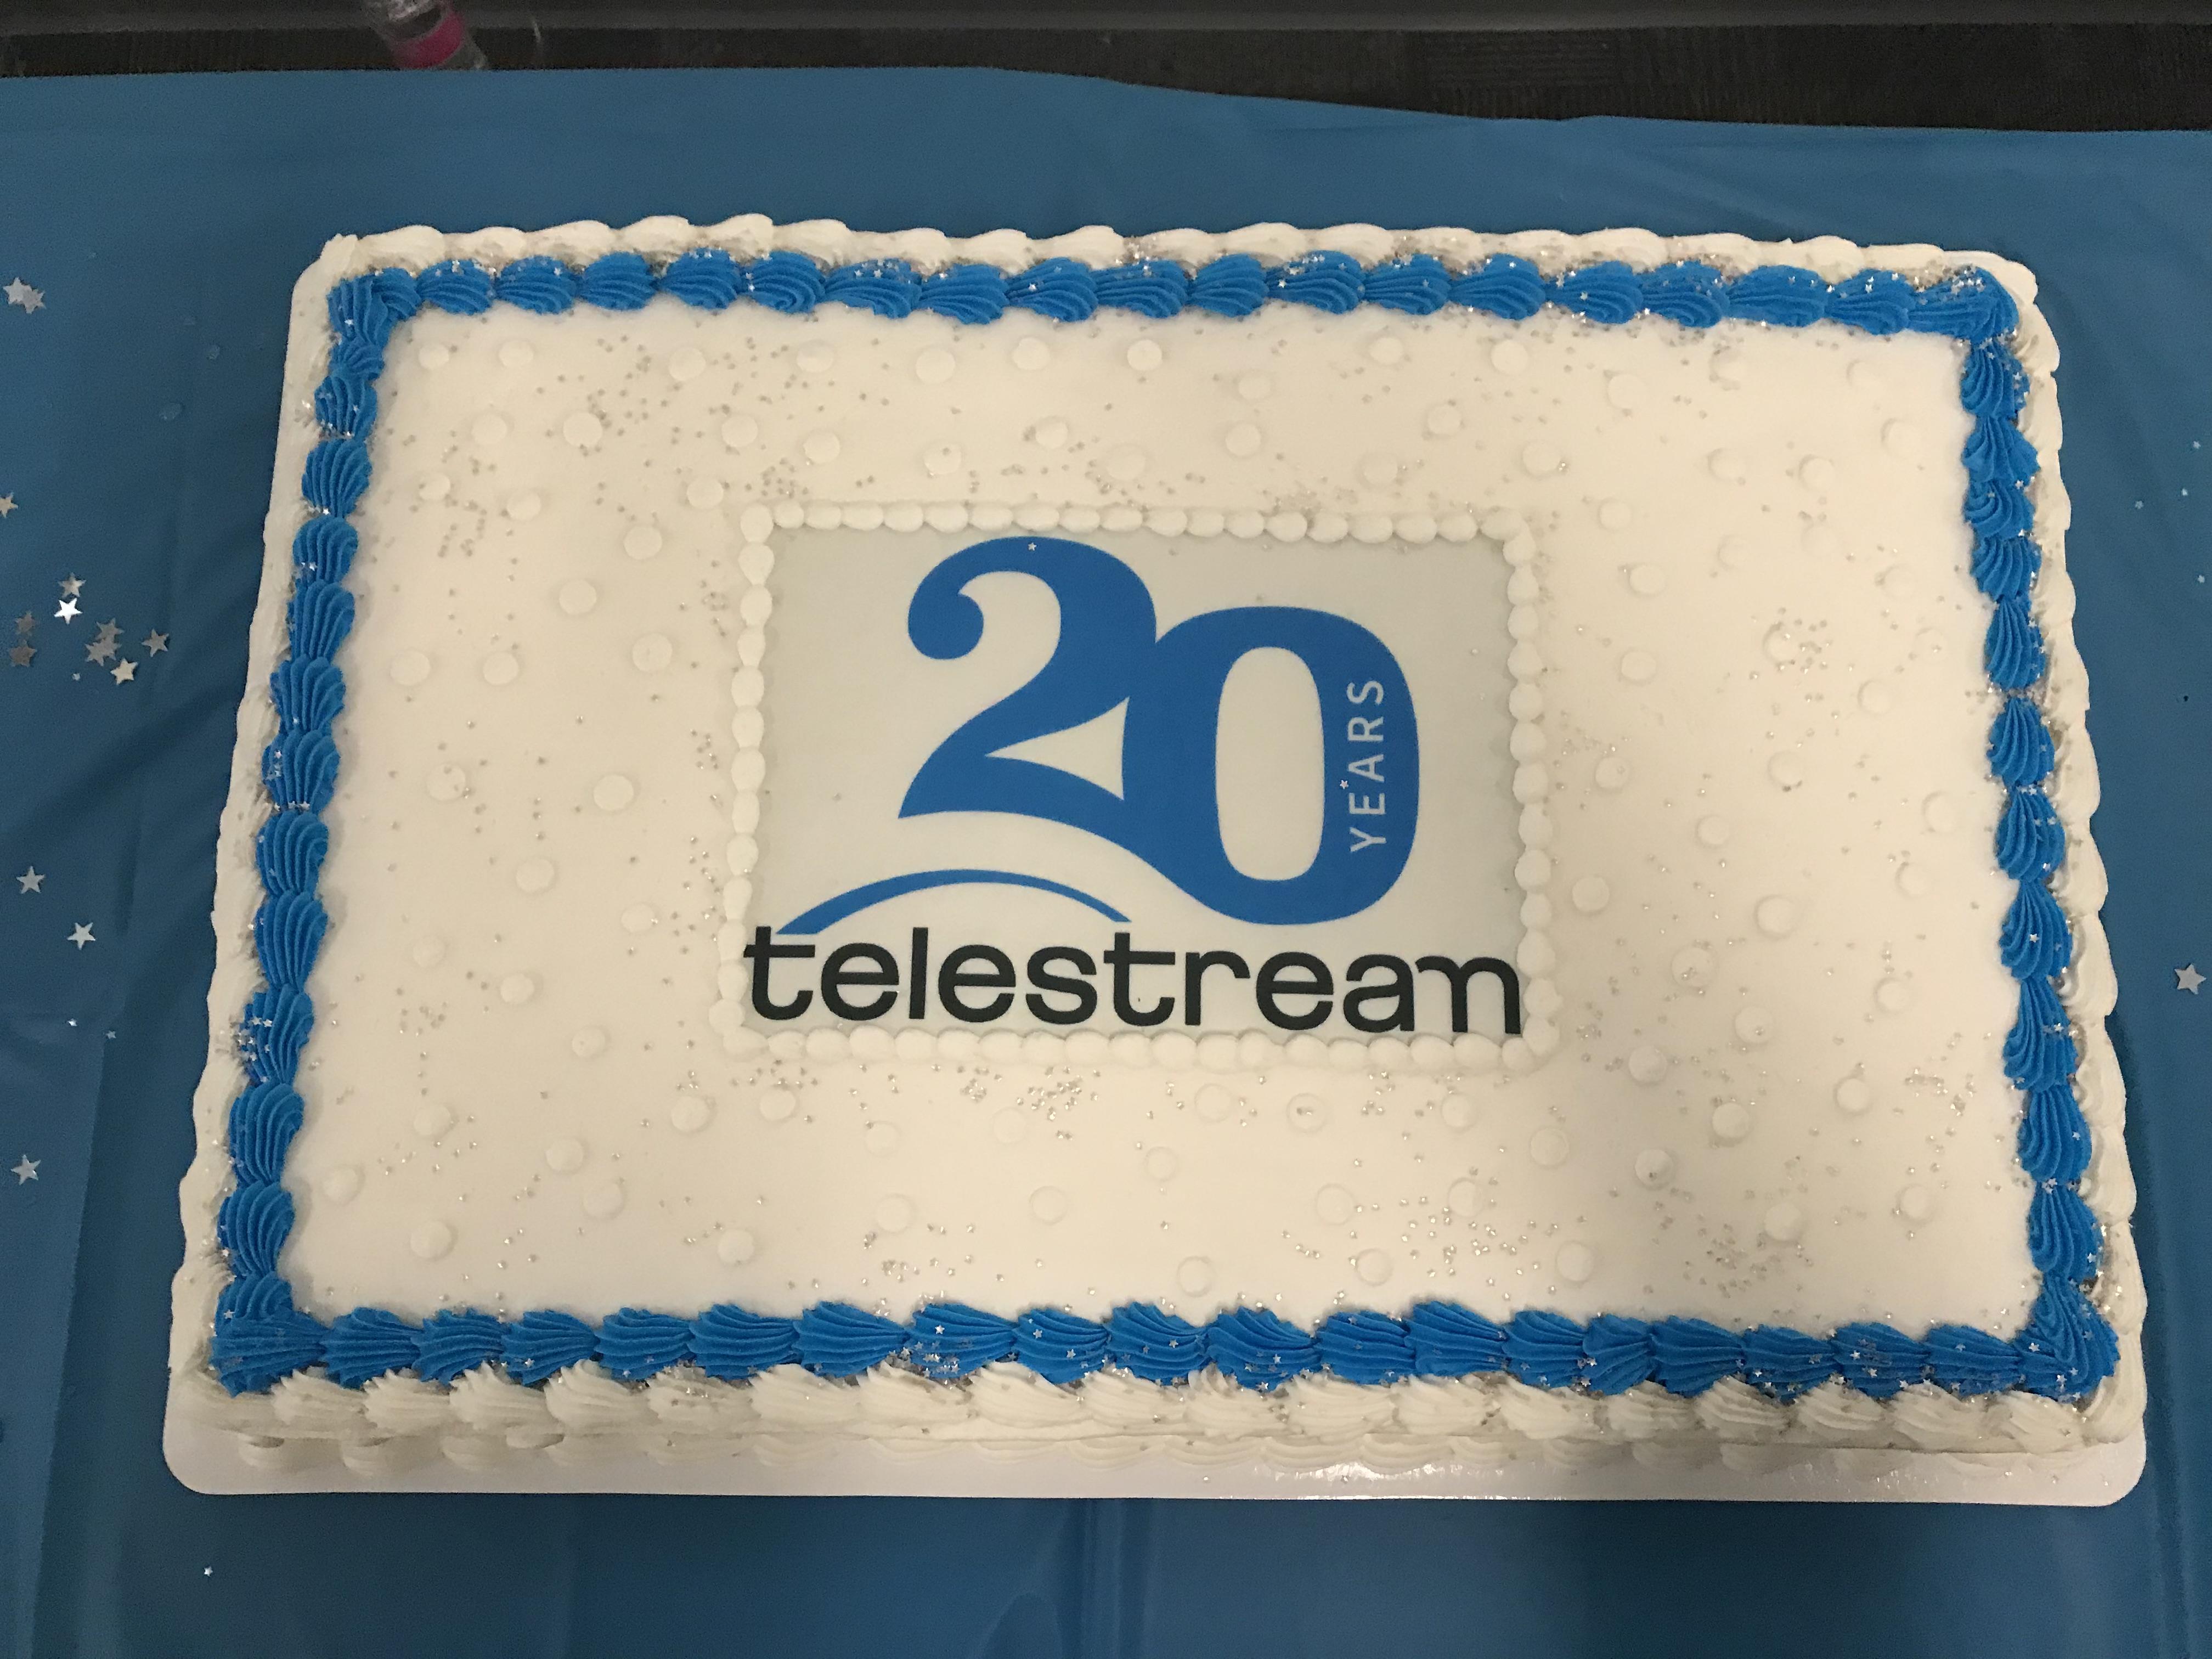 Telestream Celebrates 20 years!